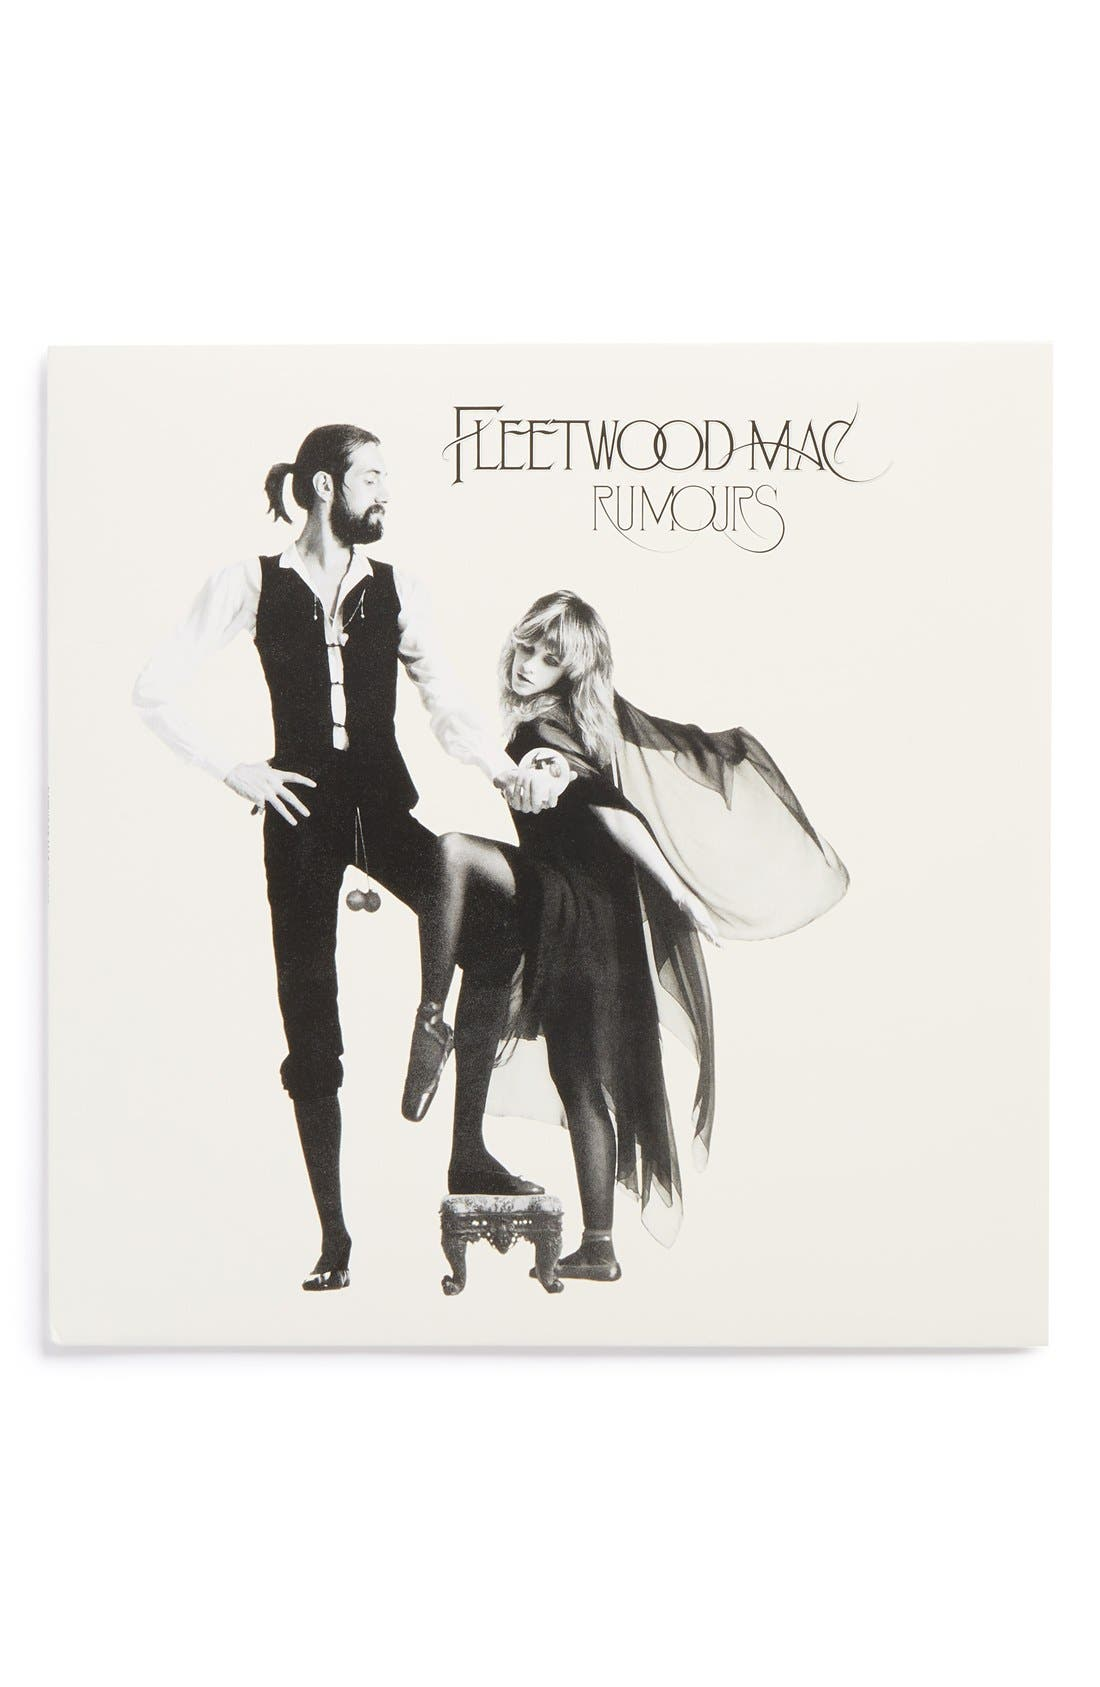 Fleetwood Mac 'Rumours' LP Vinyl Record,                         Main,                         color, 001